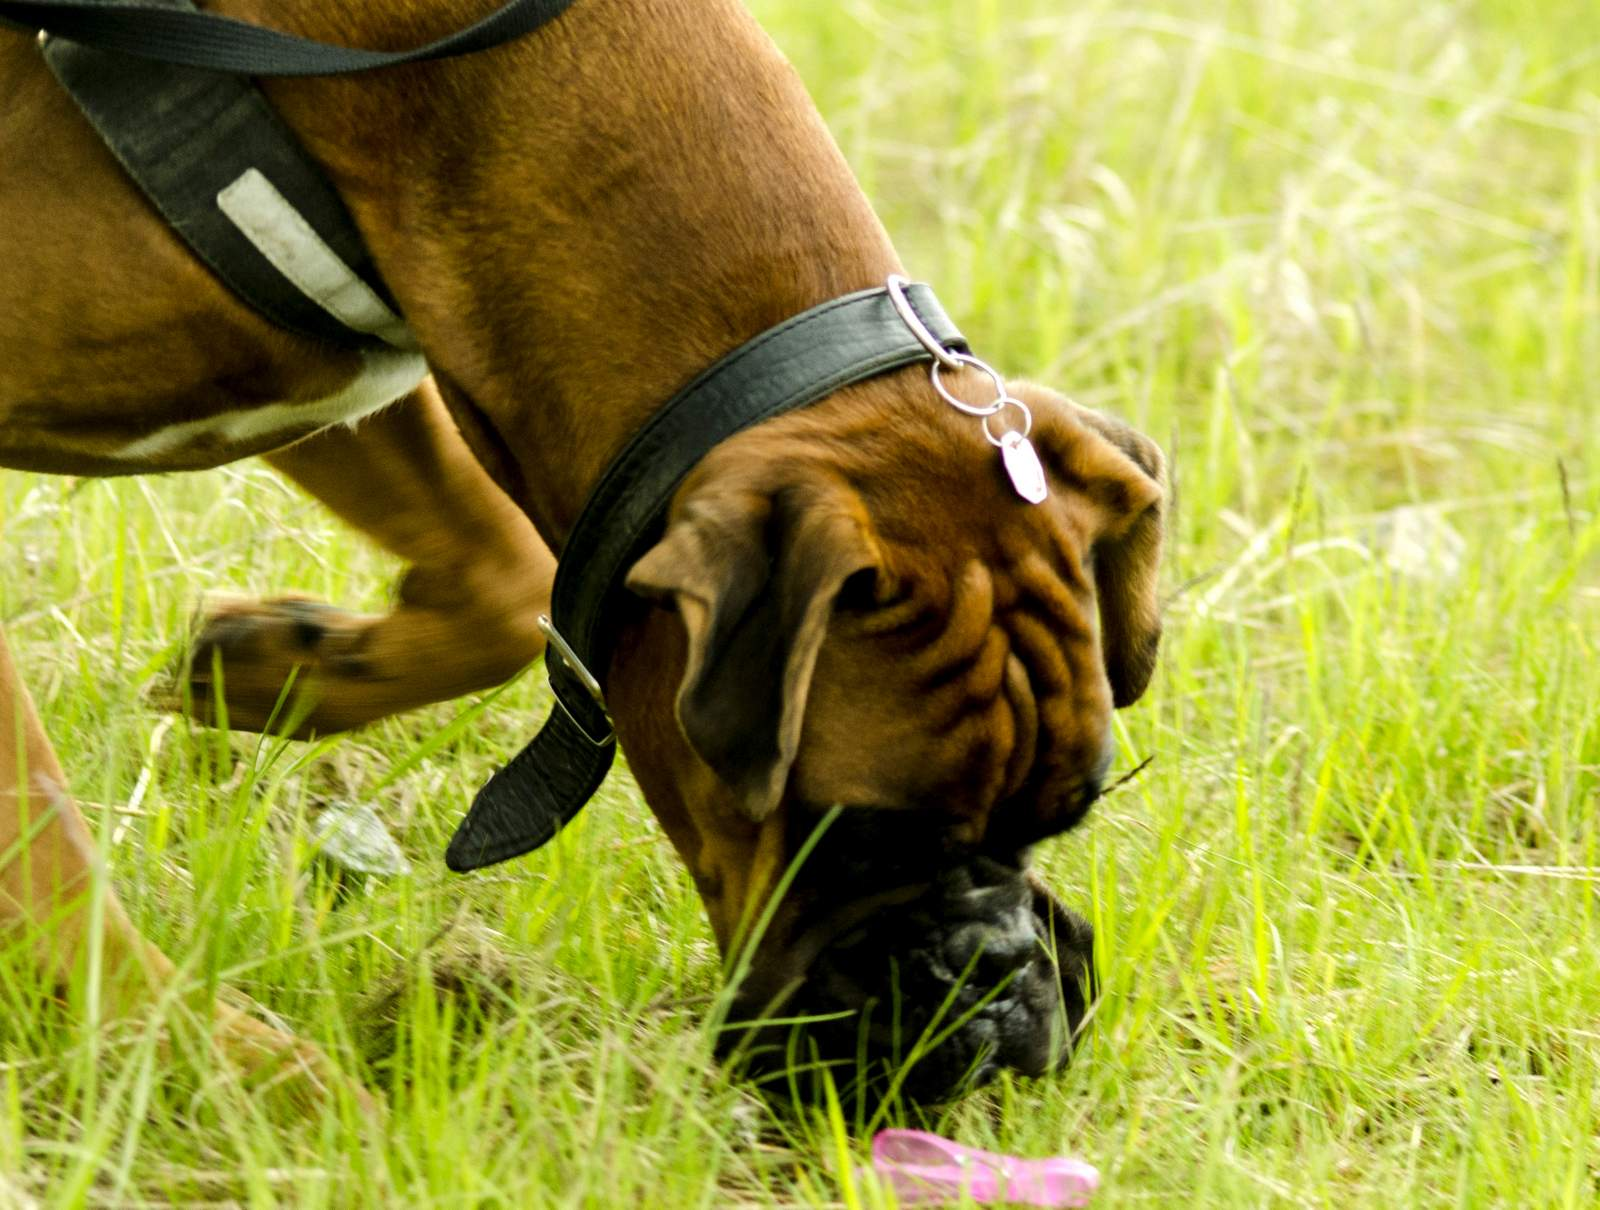 Hundeschule Termine - NEU: Schnüffelkurs für Hunde in Dortmund